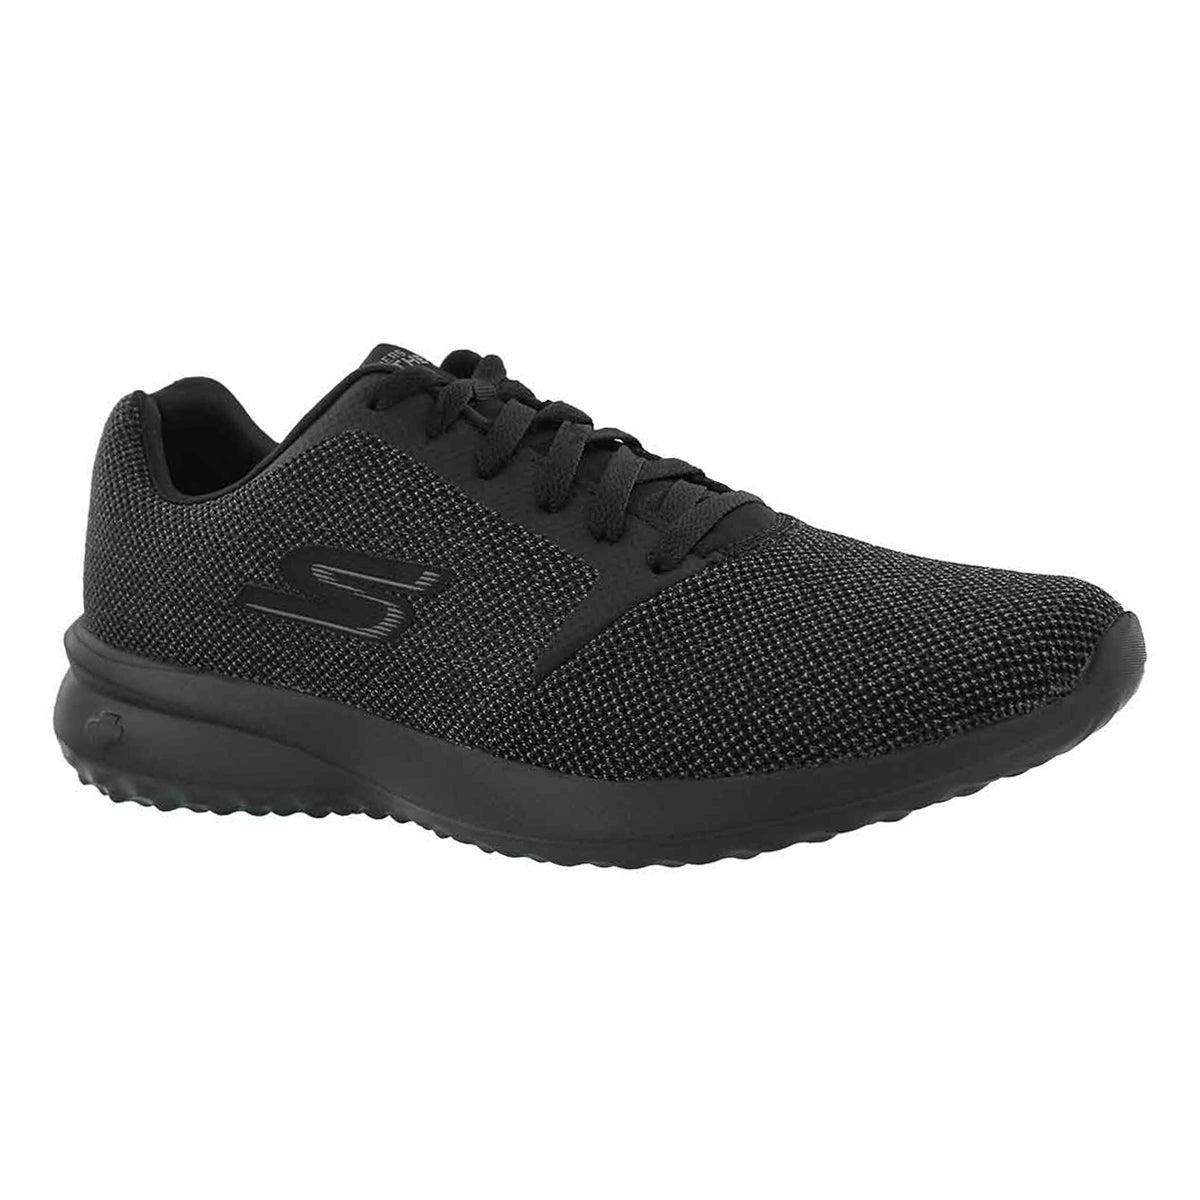 Men's ON THE GO CITY 3.0 black running shoes